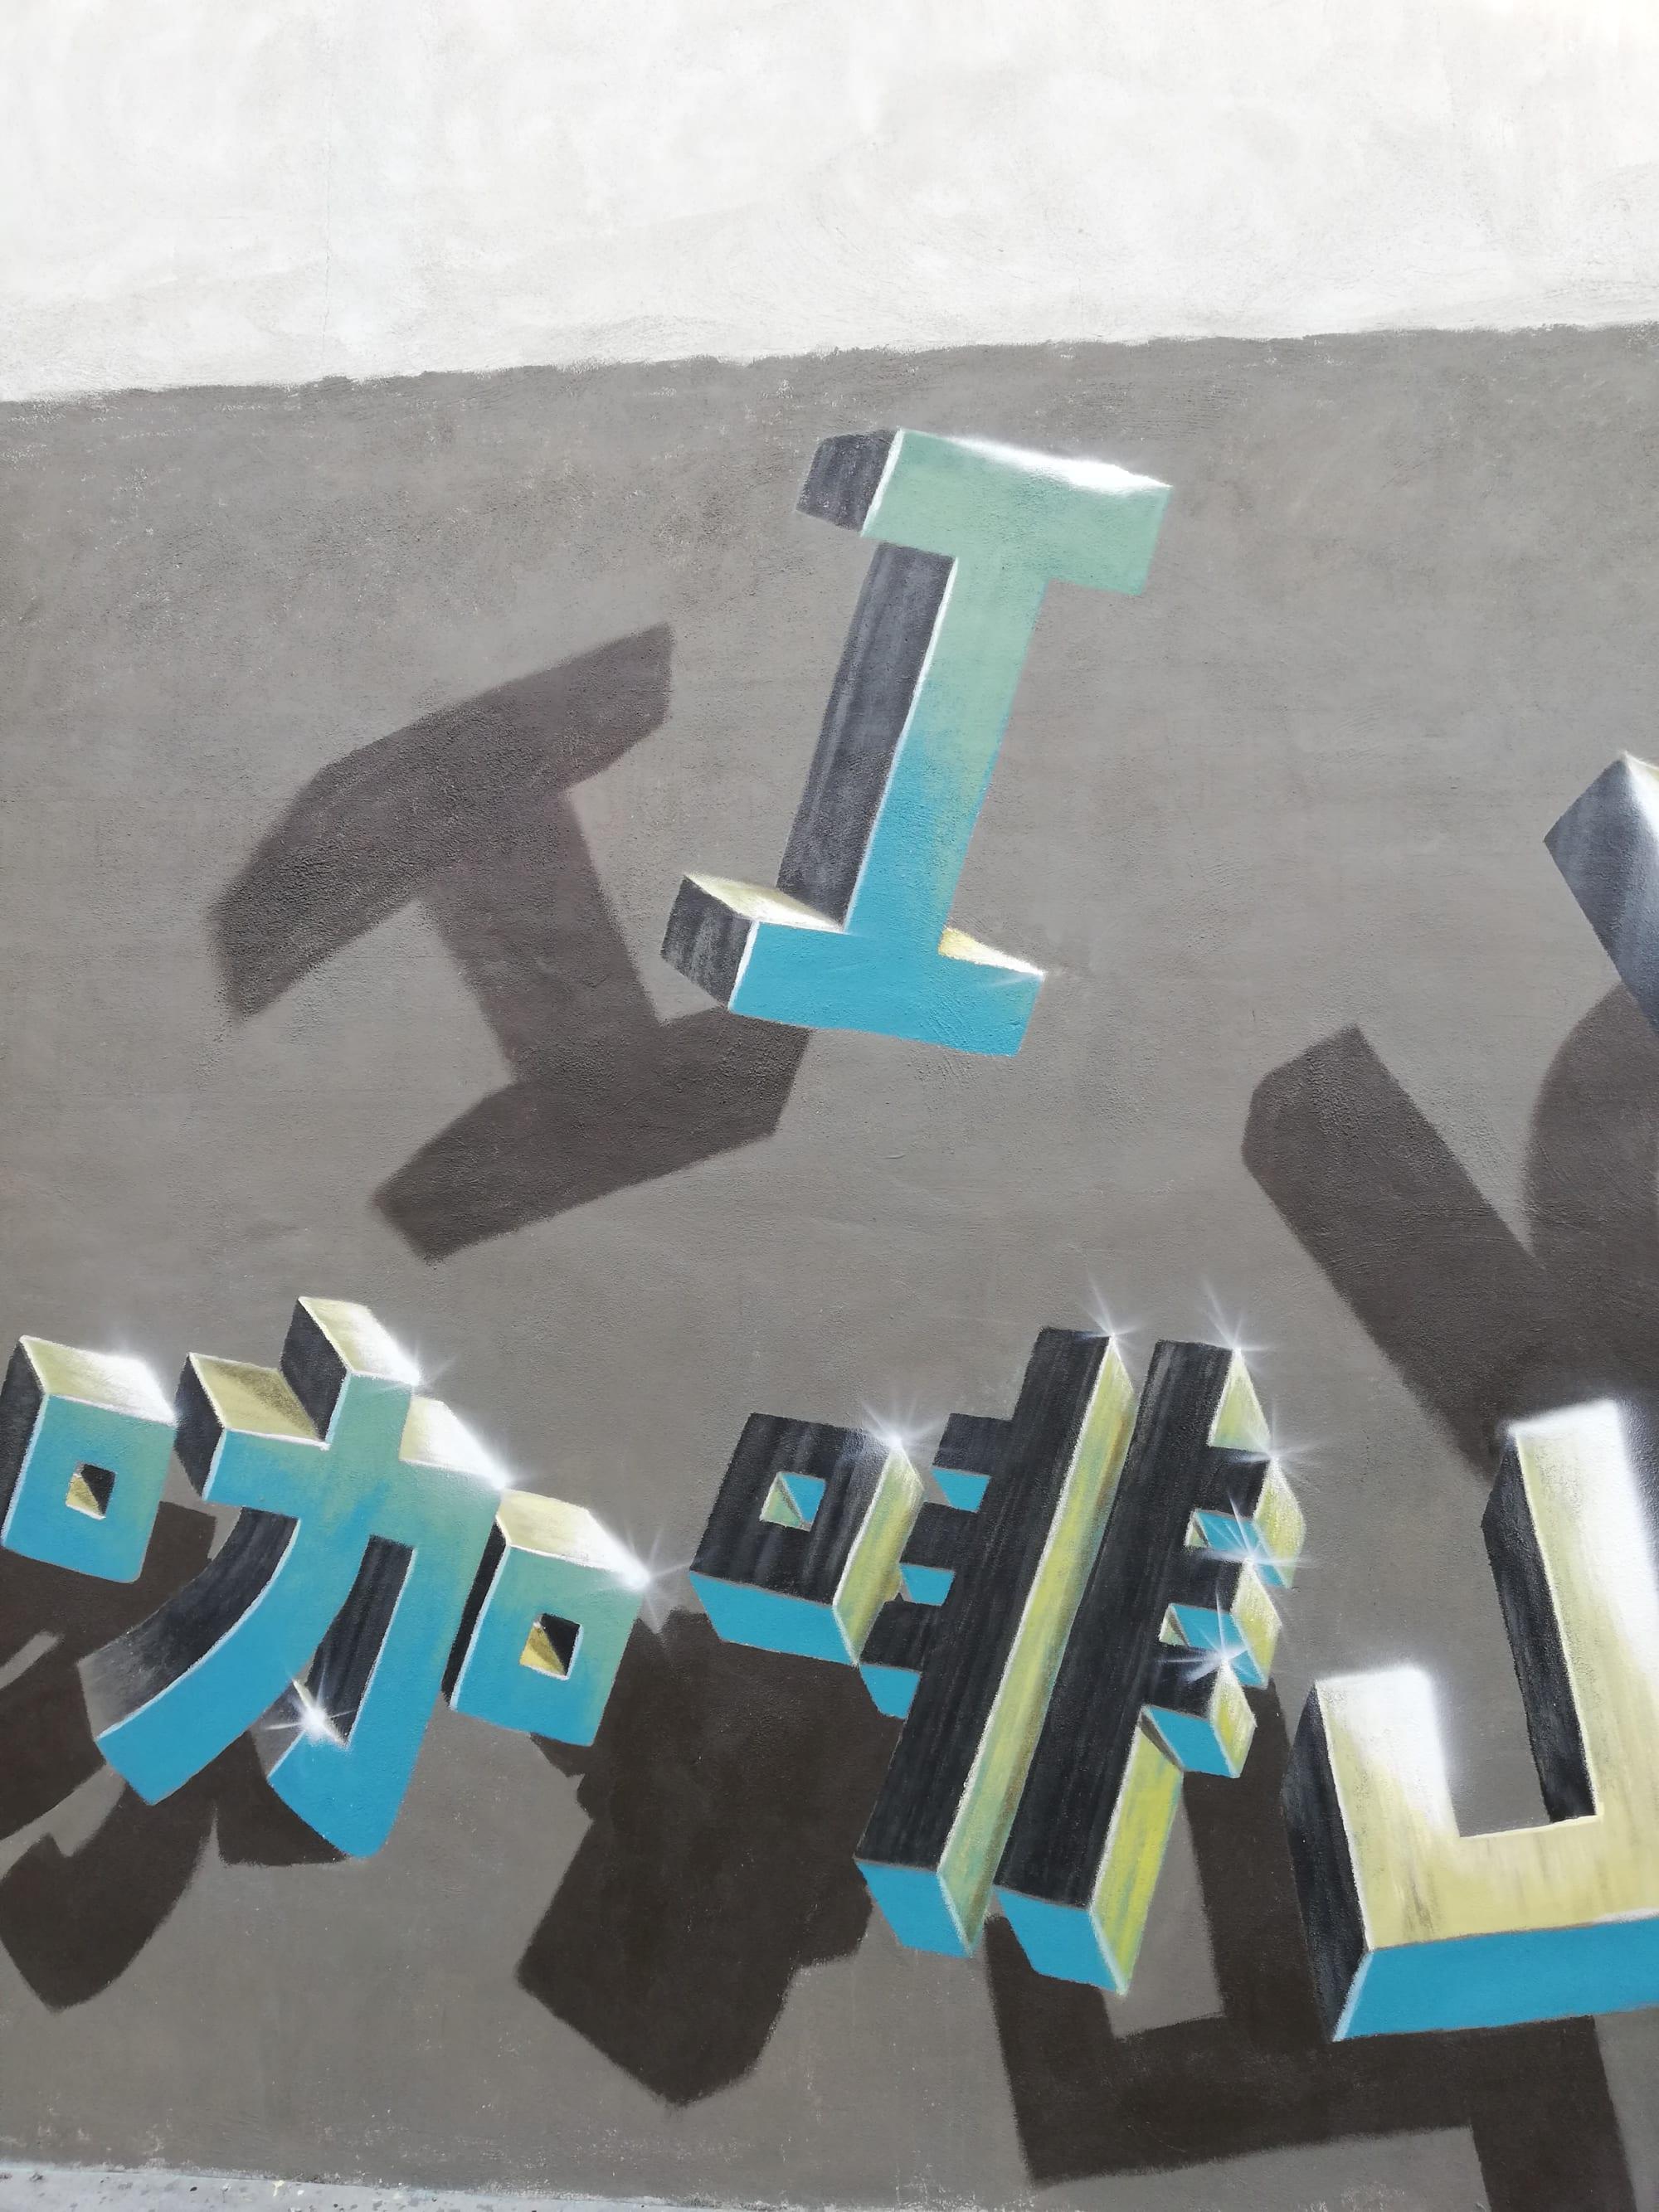 Murals by Kaeious Art seen at Kopisan Baru, Gopeng - I LOVE YOU KOPISAN ❤️ I LOVE YOU 咖啡山